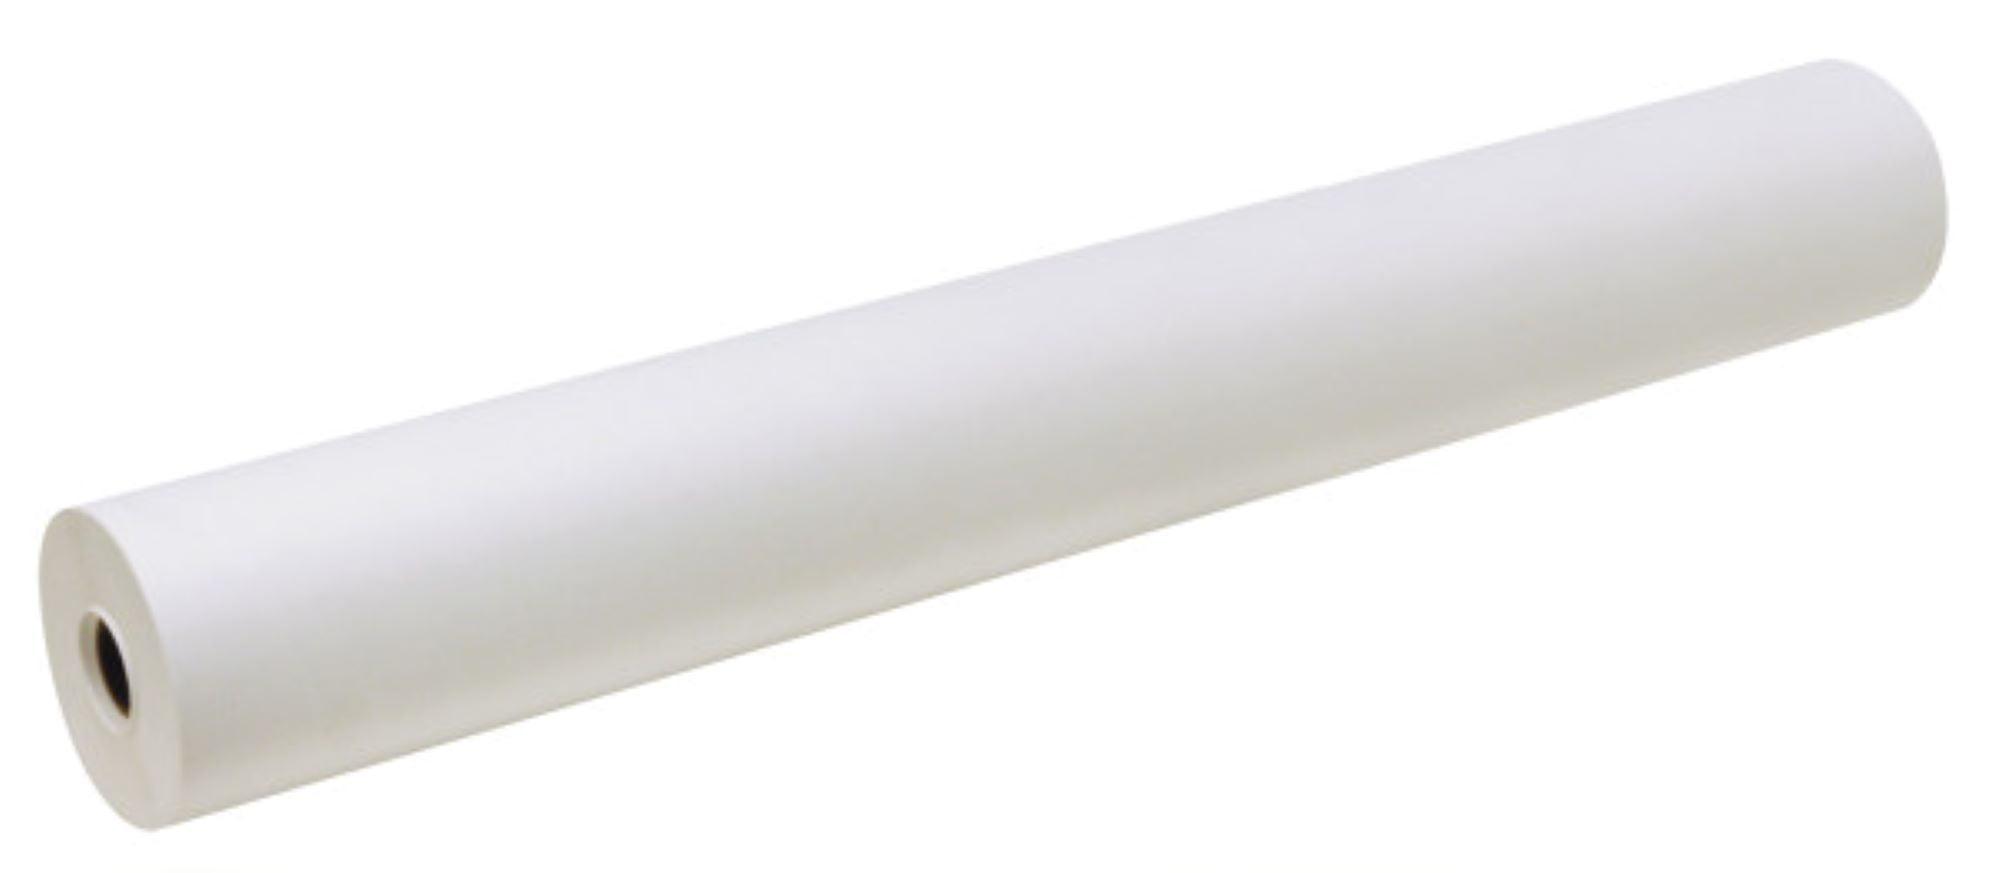 24-Inch x 200-Feet 4765 White, PACON Easel Roll